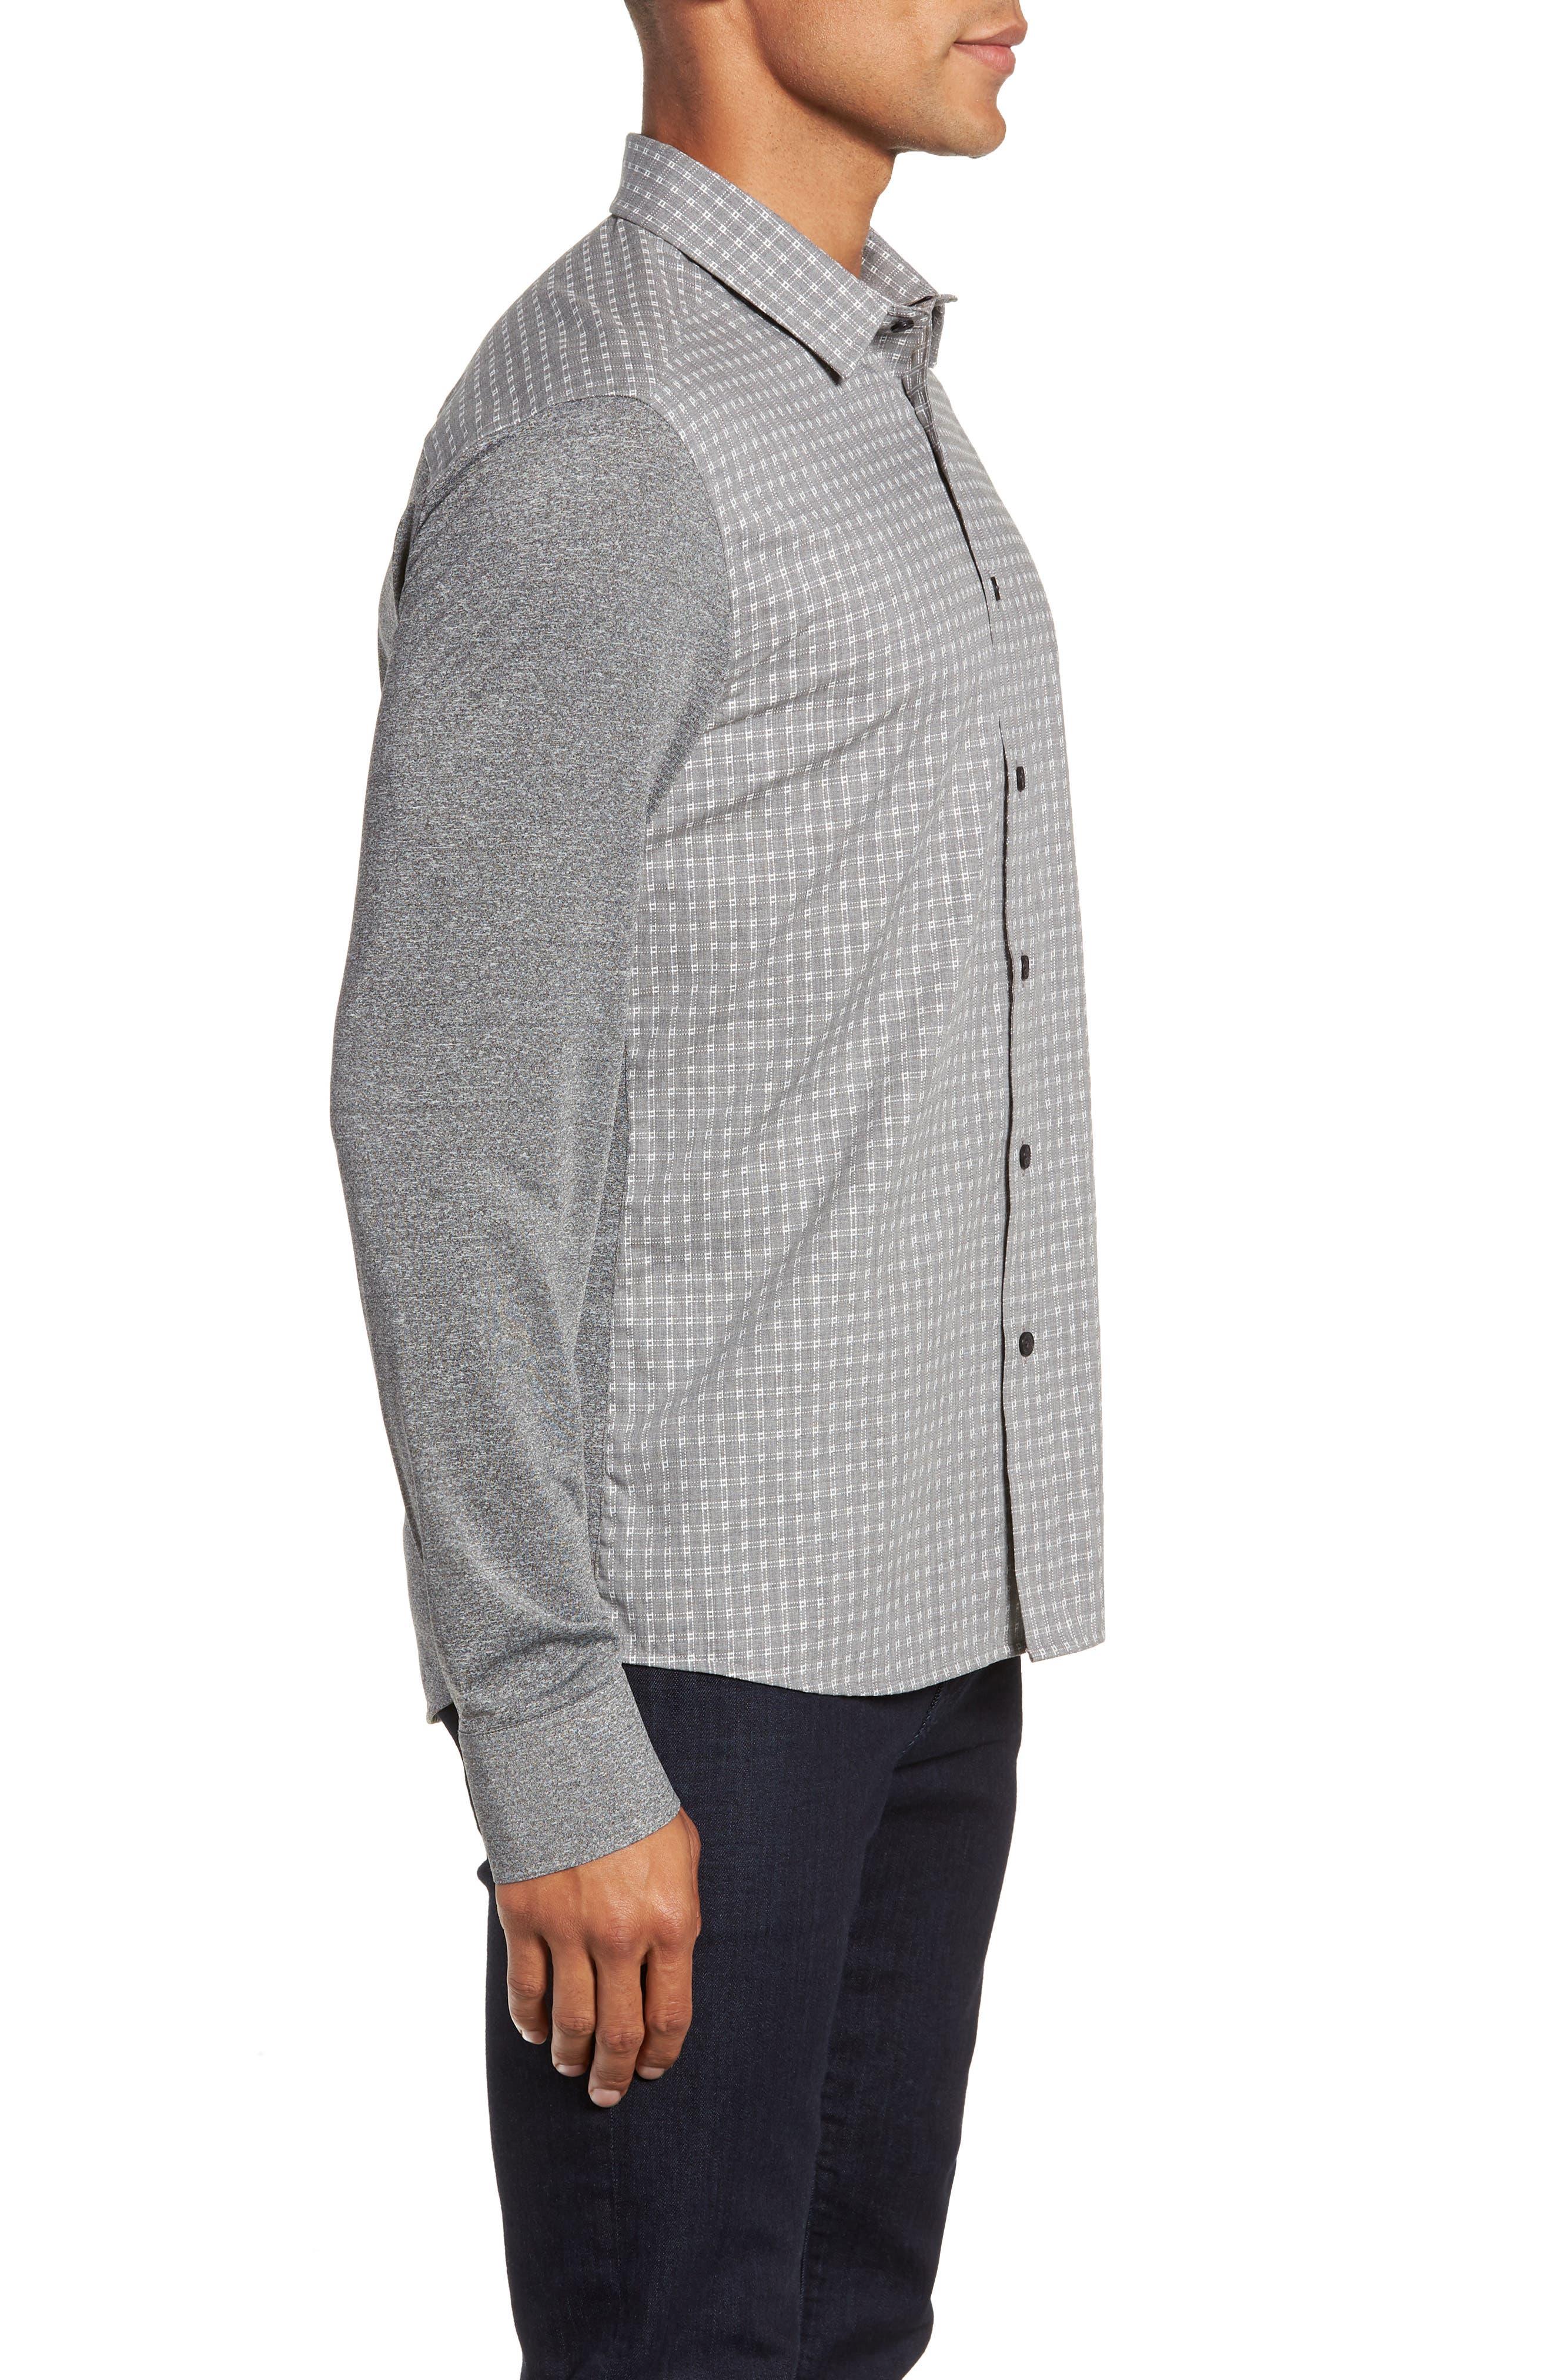 VINCE CAMUTO,                             Slim Fit Mixed Media Sport Shirt,                             Alternate thumbnail 4, color,                             034